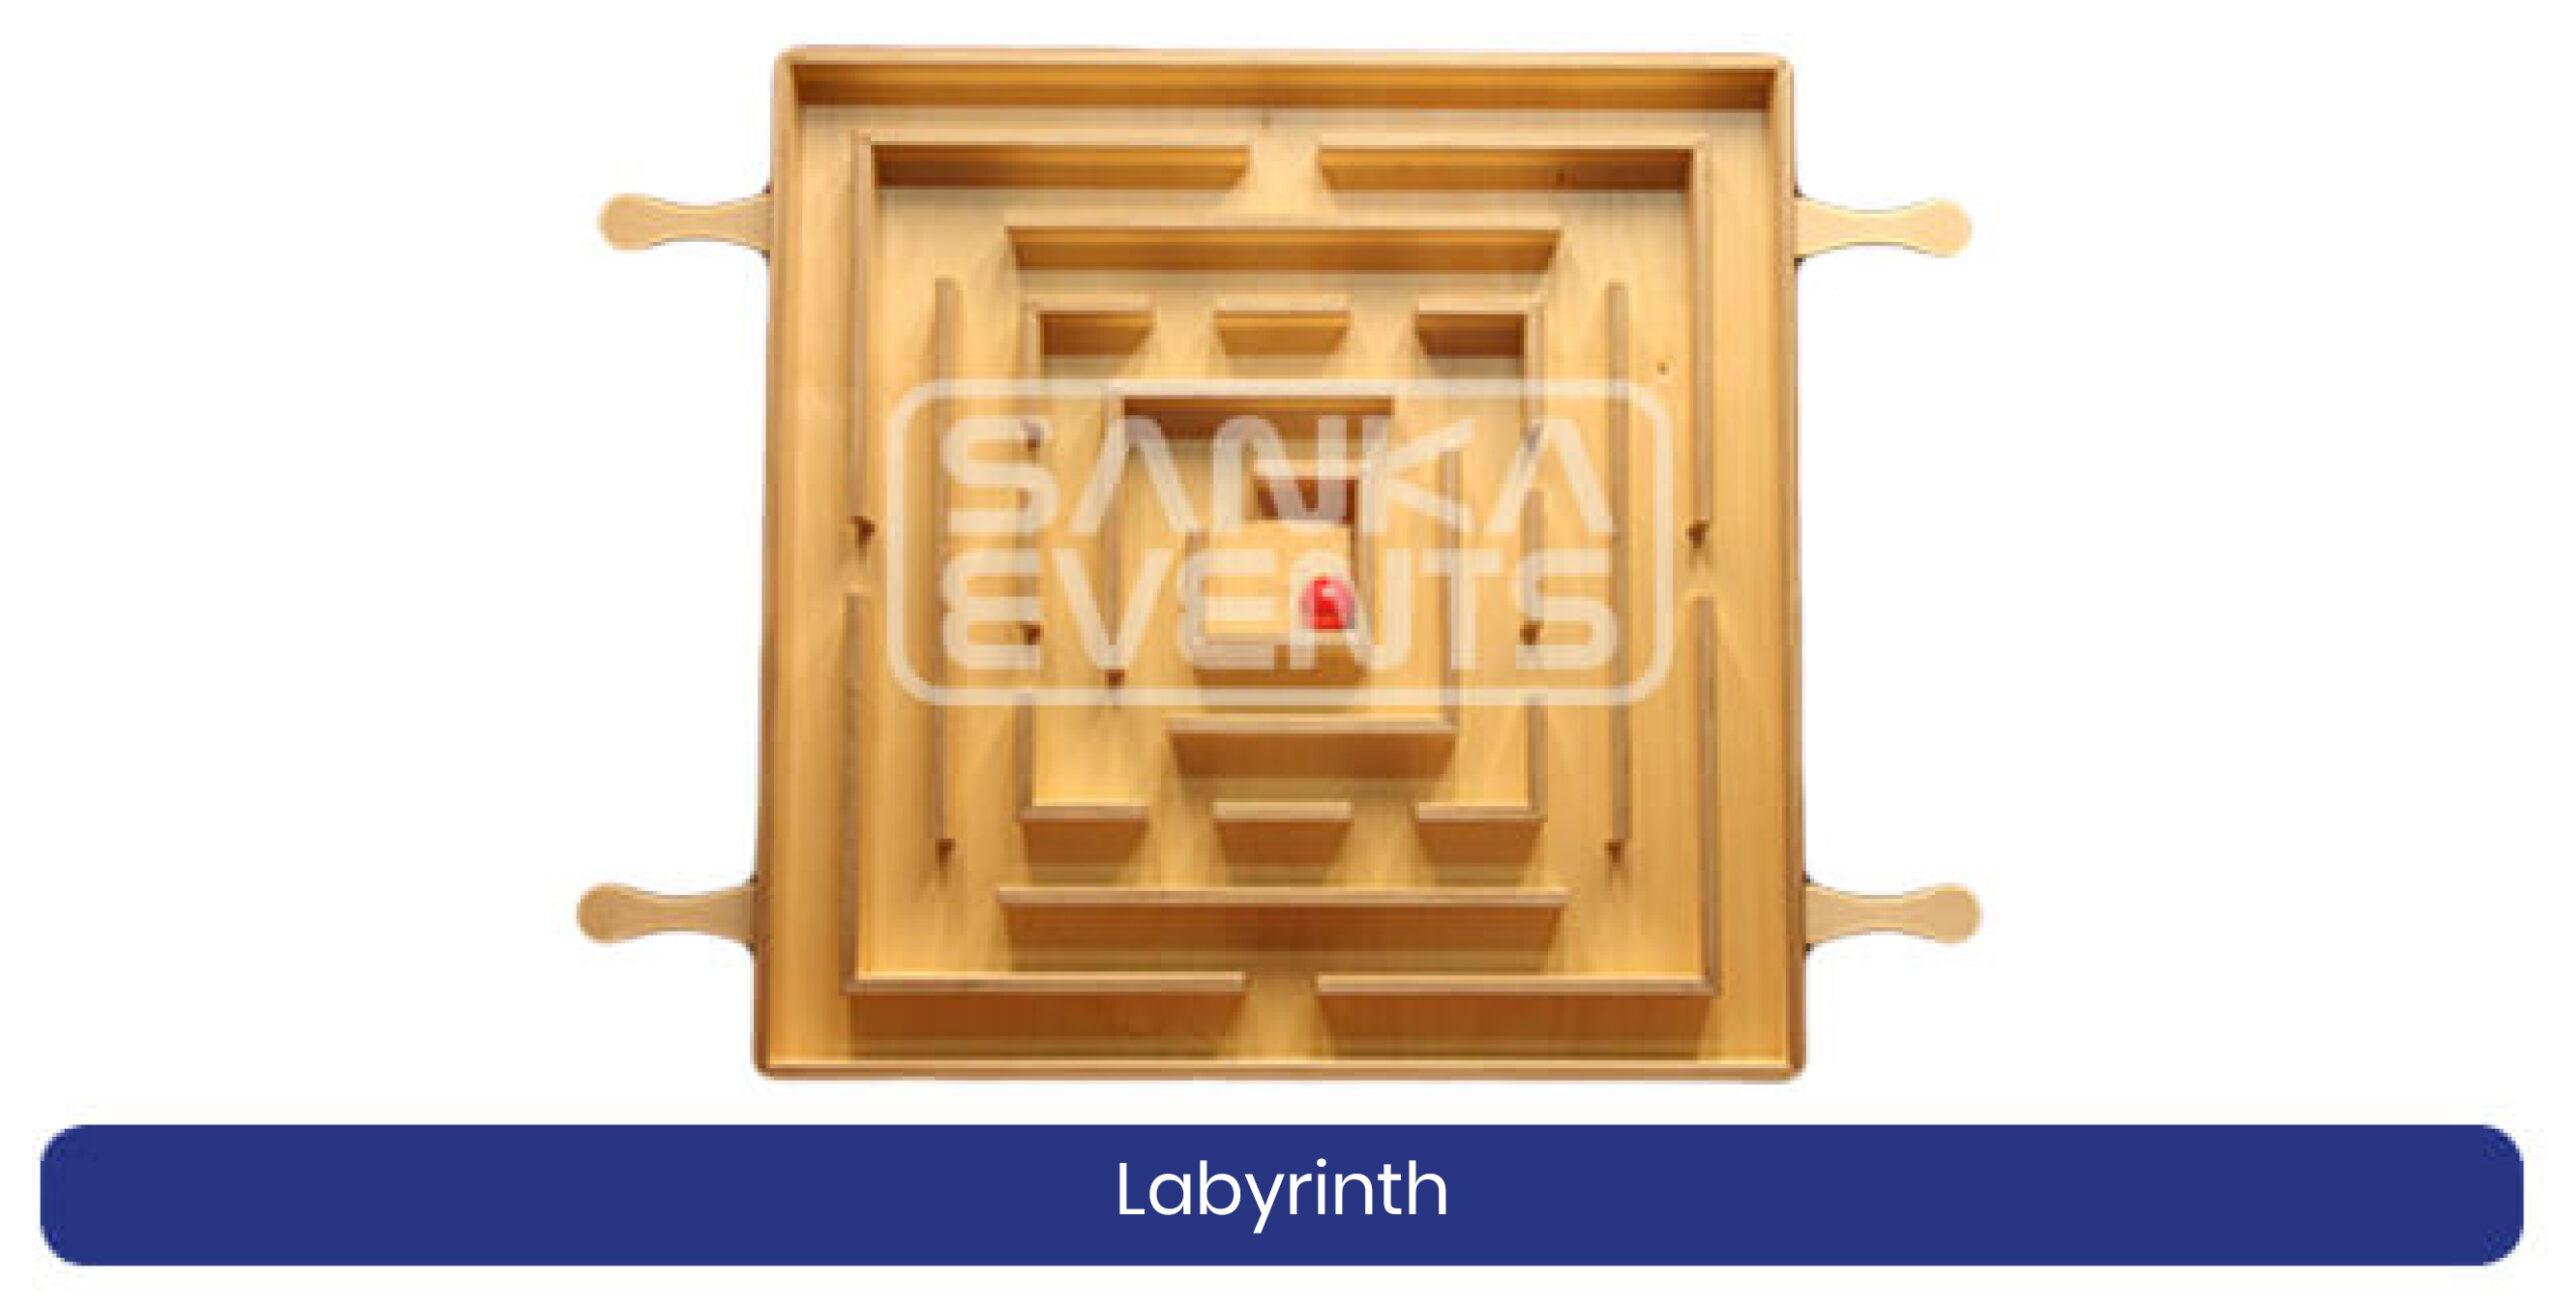 Coronaproof Spellenpakket Labyrinth